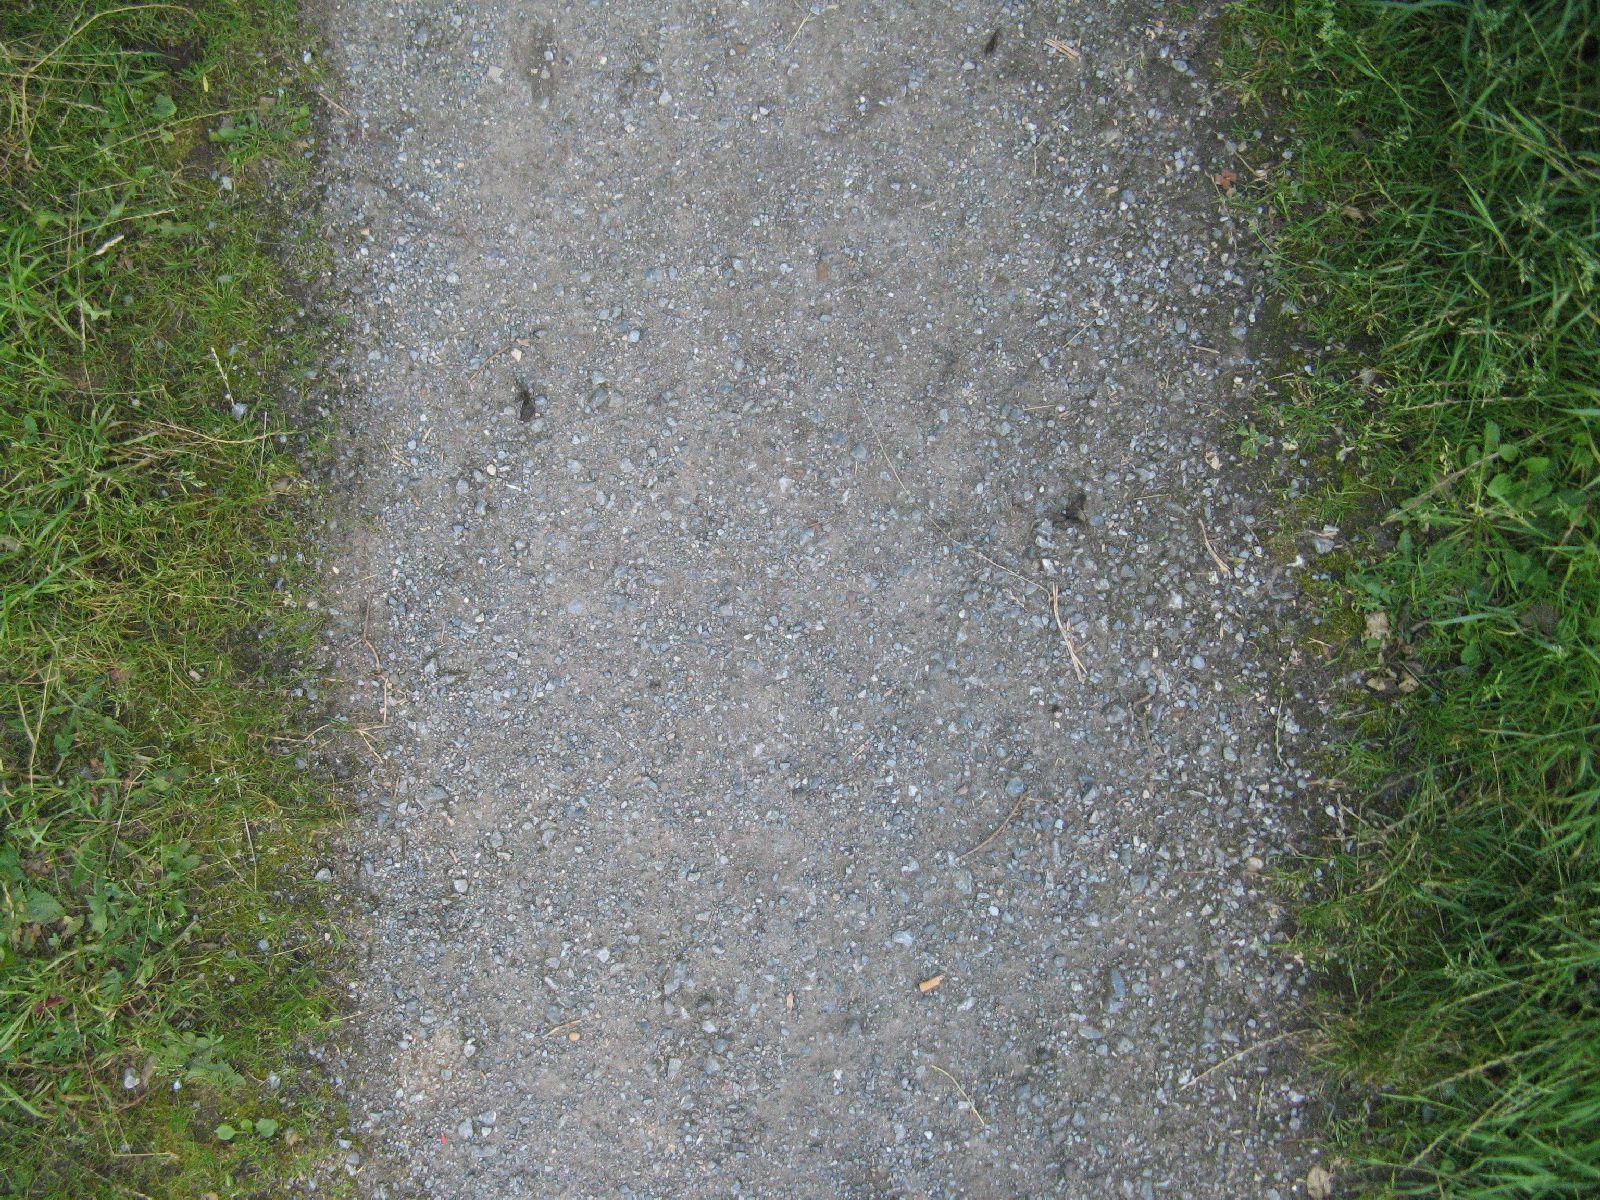 Boden-Gras-Moos-Blumen_Textur_B_00902